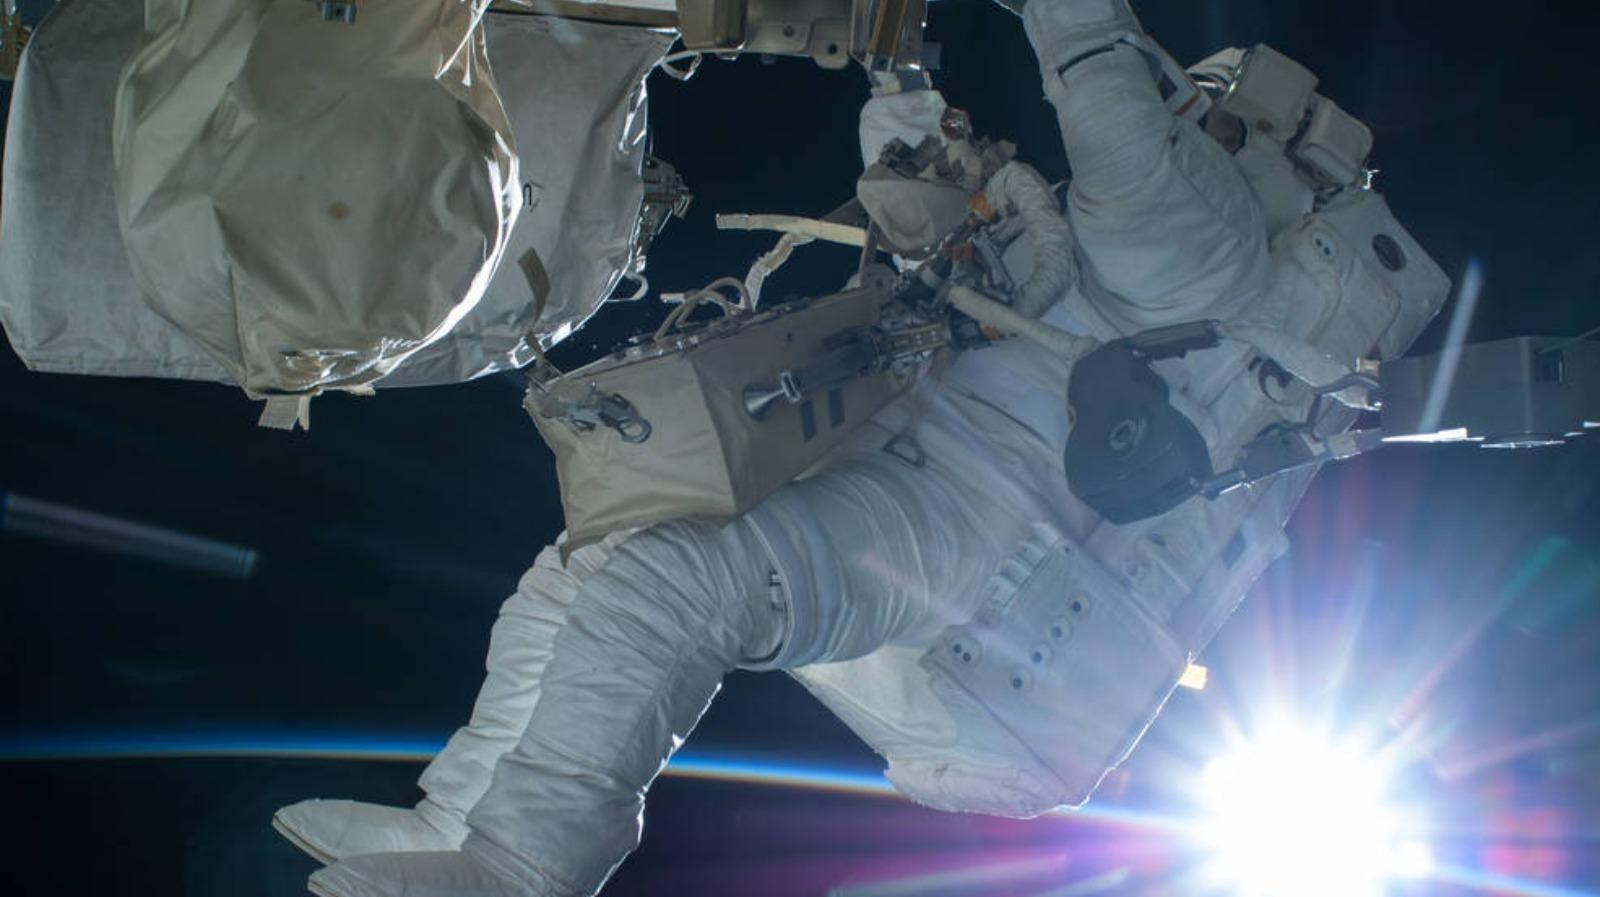 nasa astronauts 2017 - photo #29